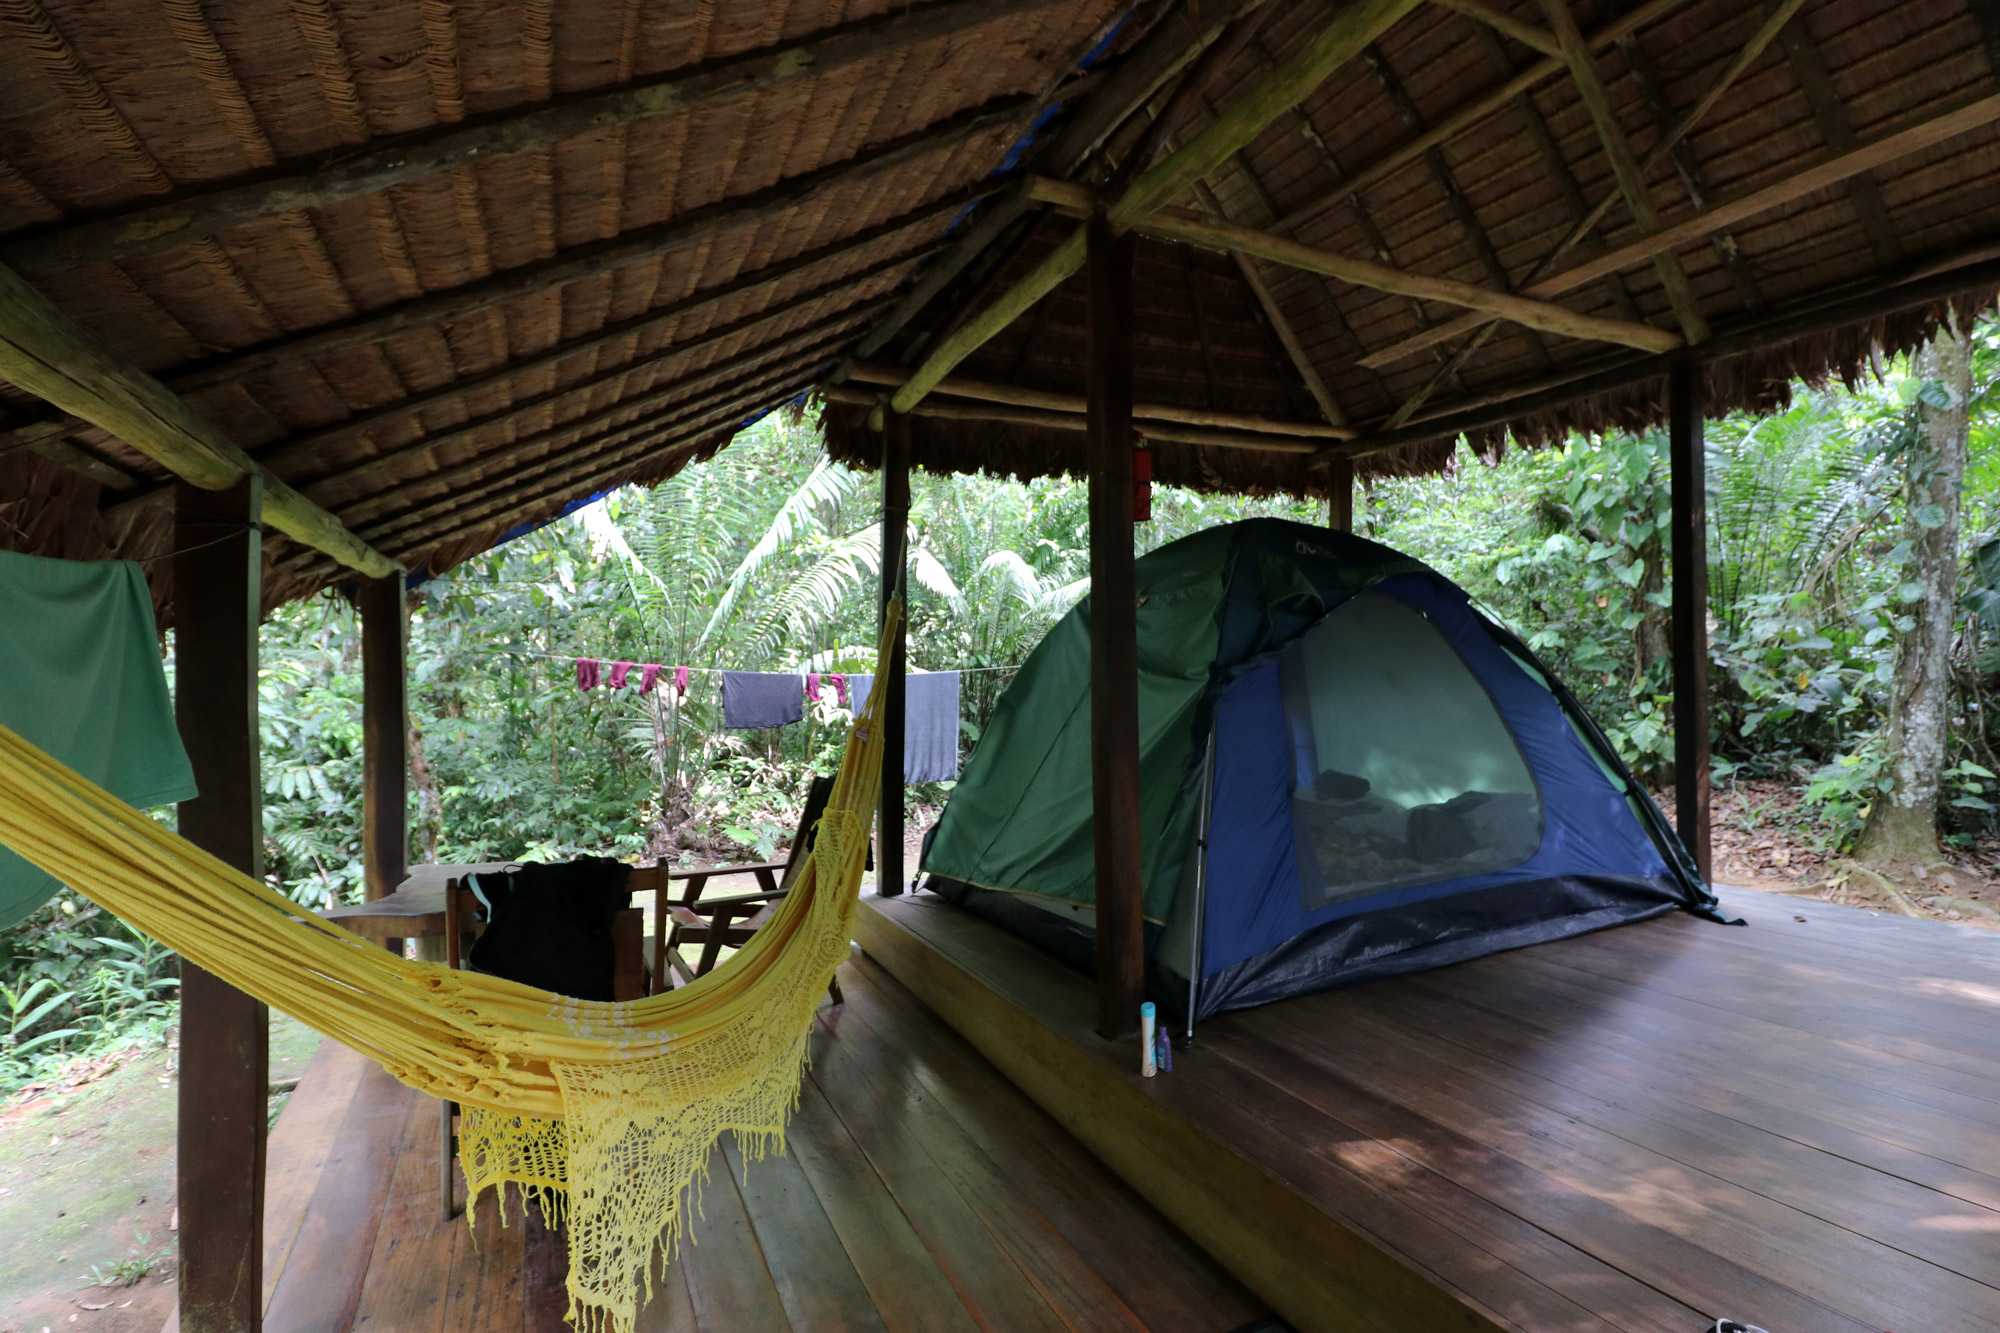 Bolivia 2016 - Dag 15 - Onze tenten in Berraco del Madidi